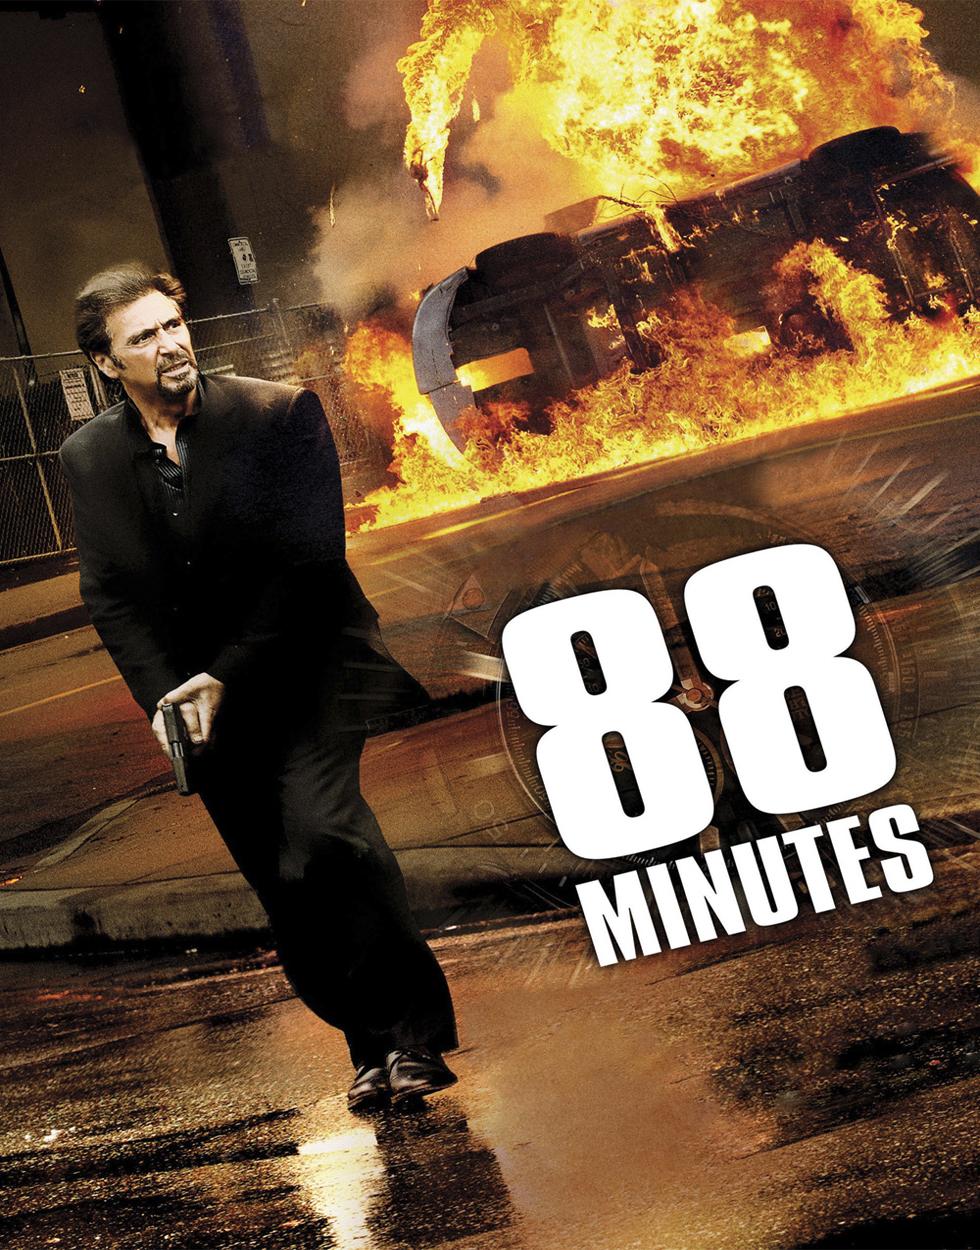 88 minutes.jpg